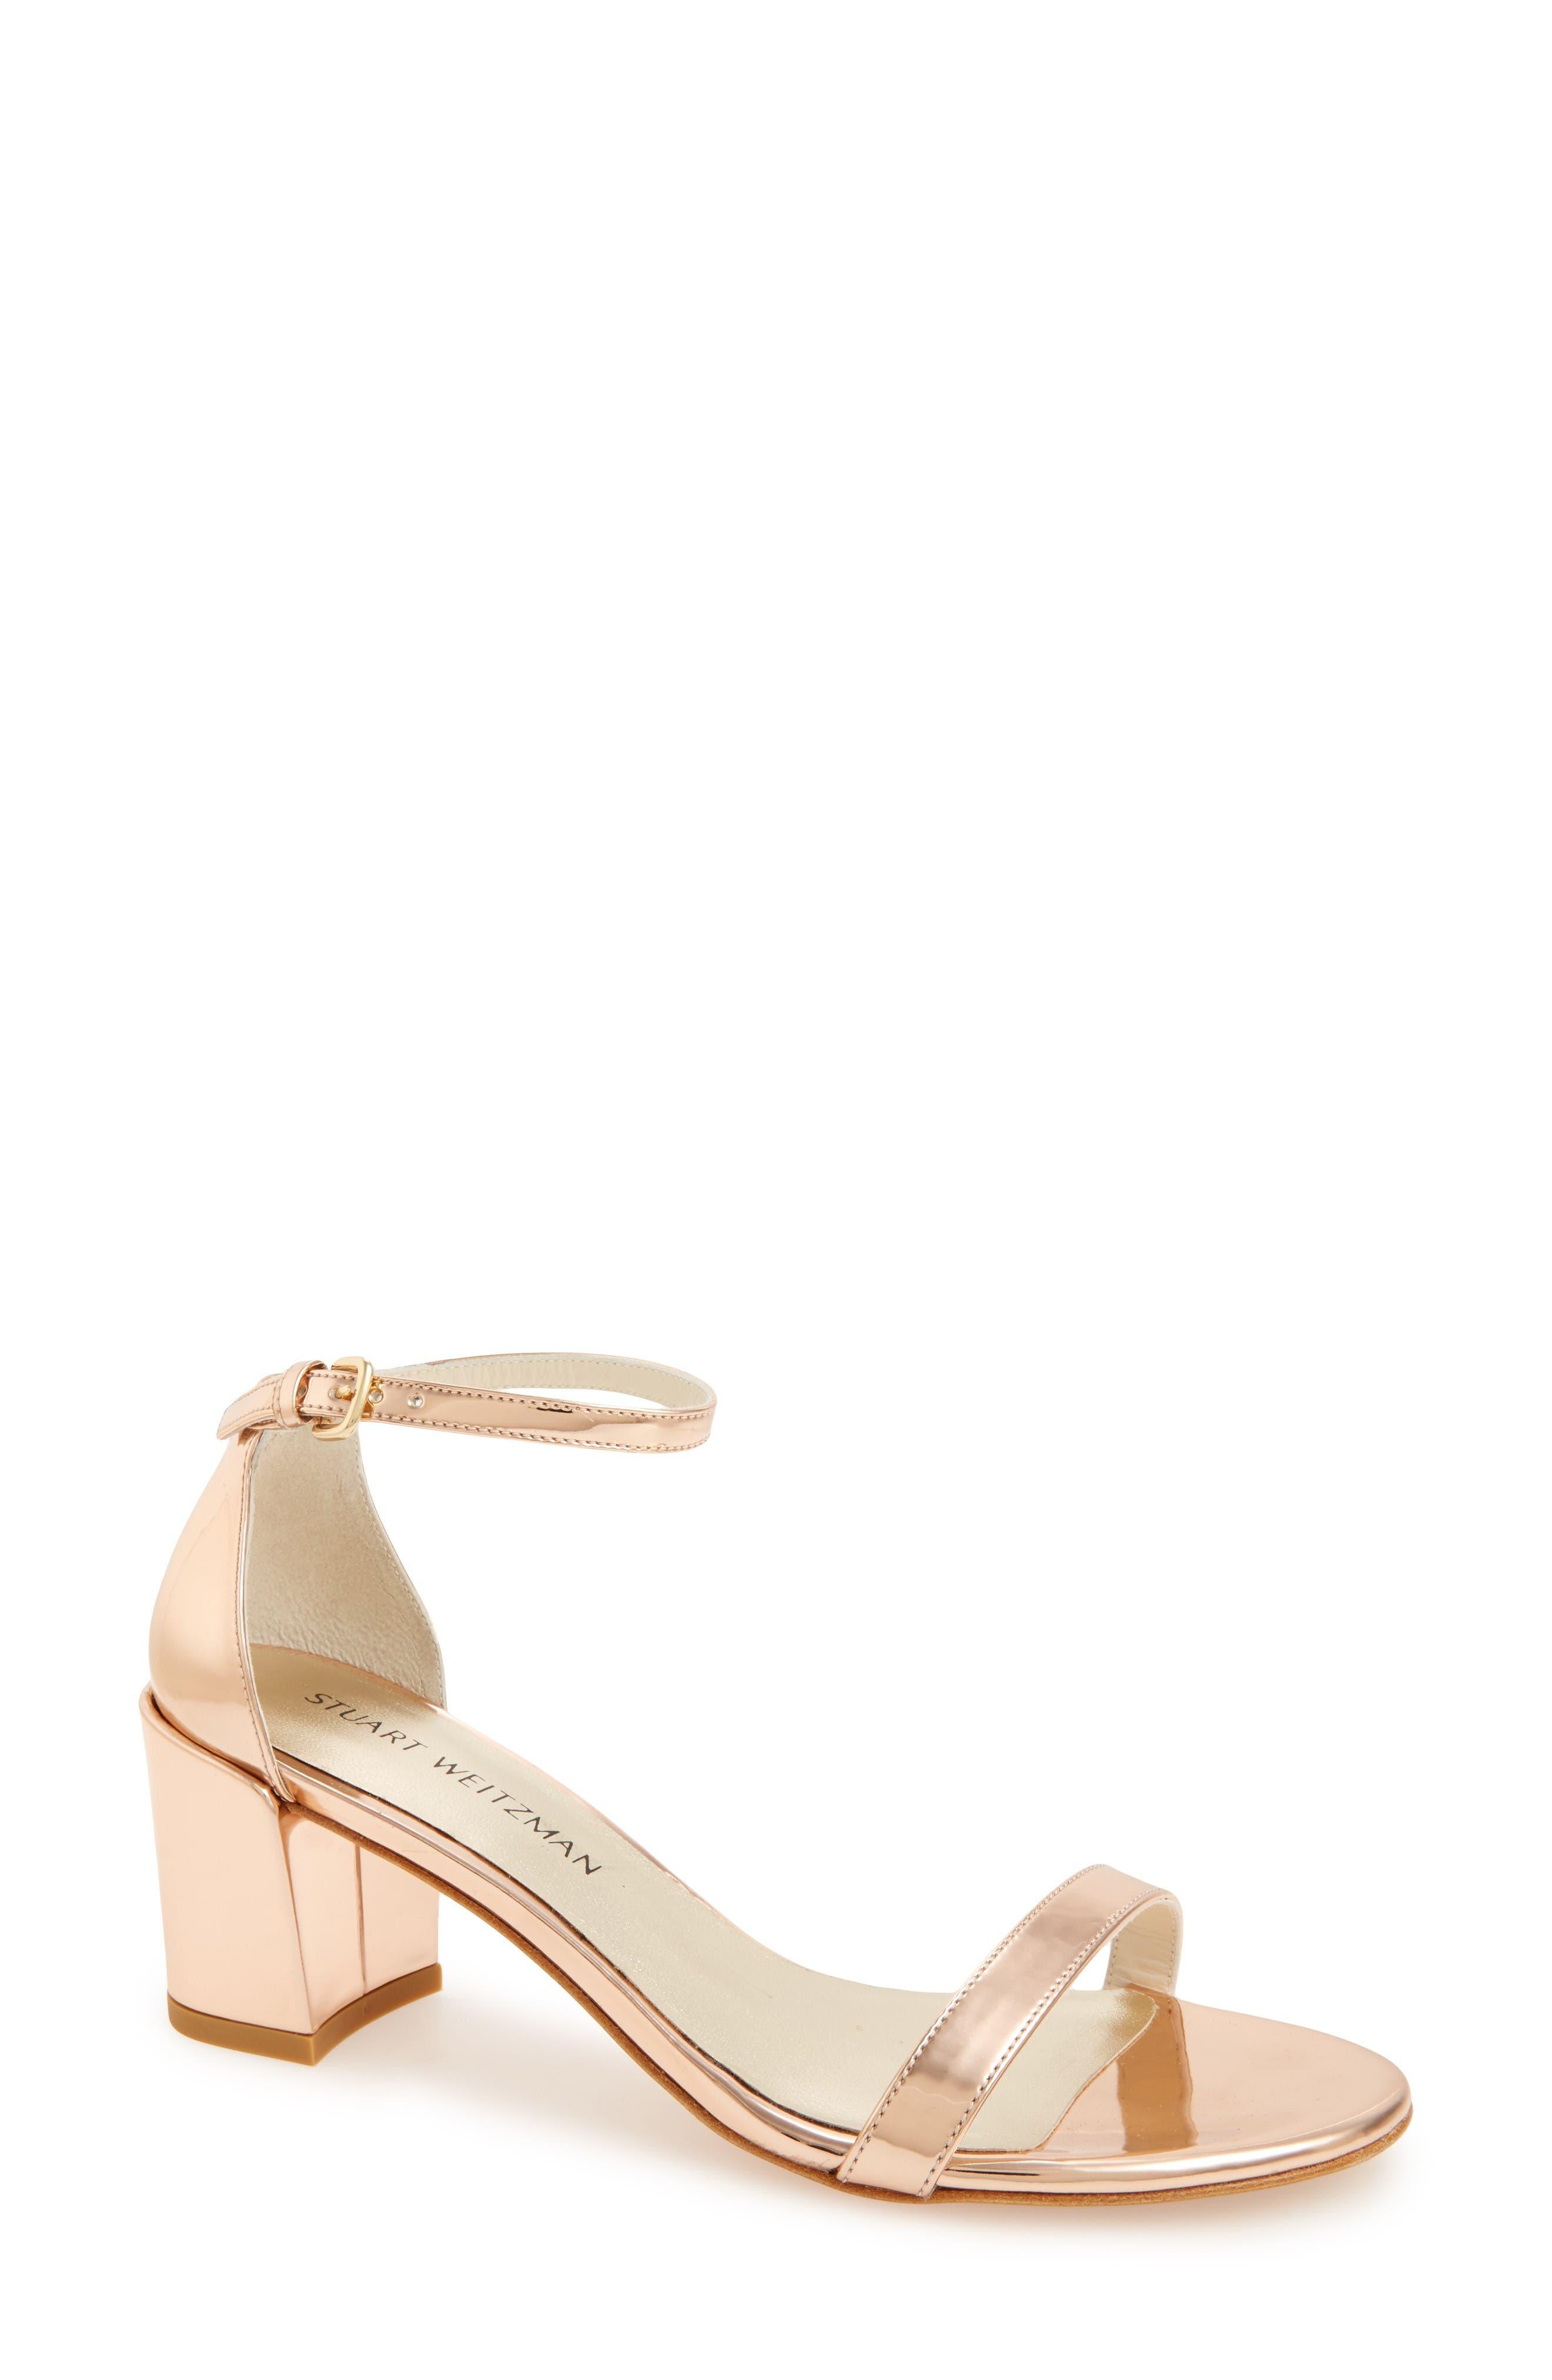 Stuart Weitzman Simple Ankle Strap Sandal (Women)